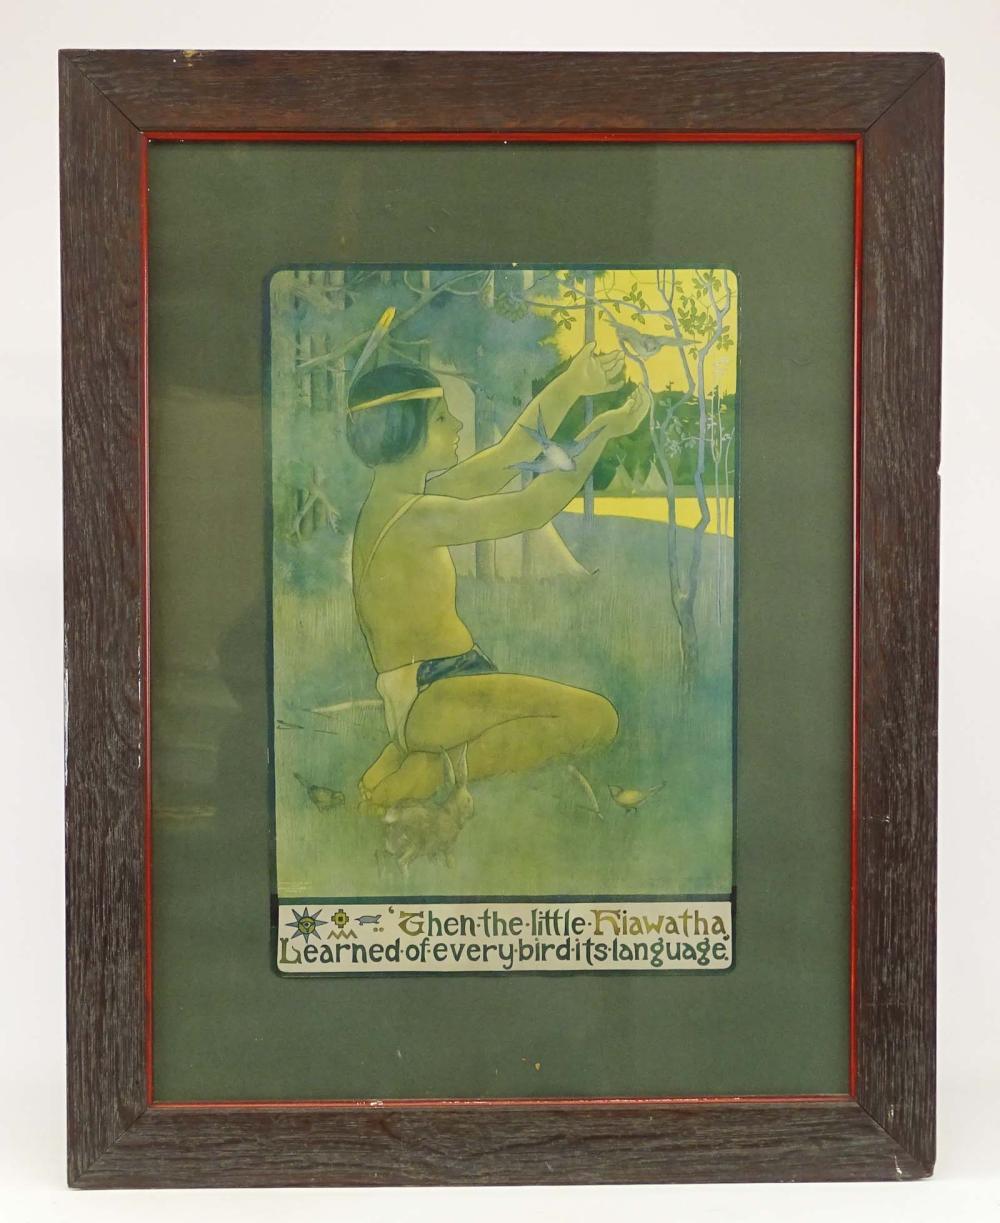 Arts & Crafts Period Framed Print